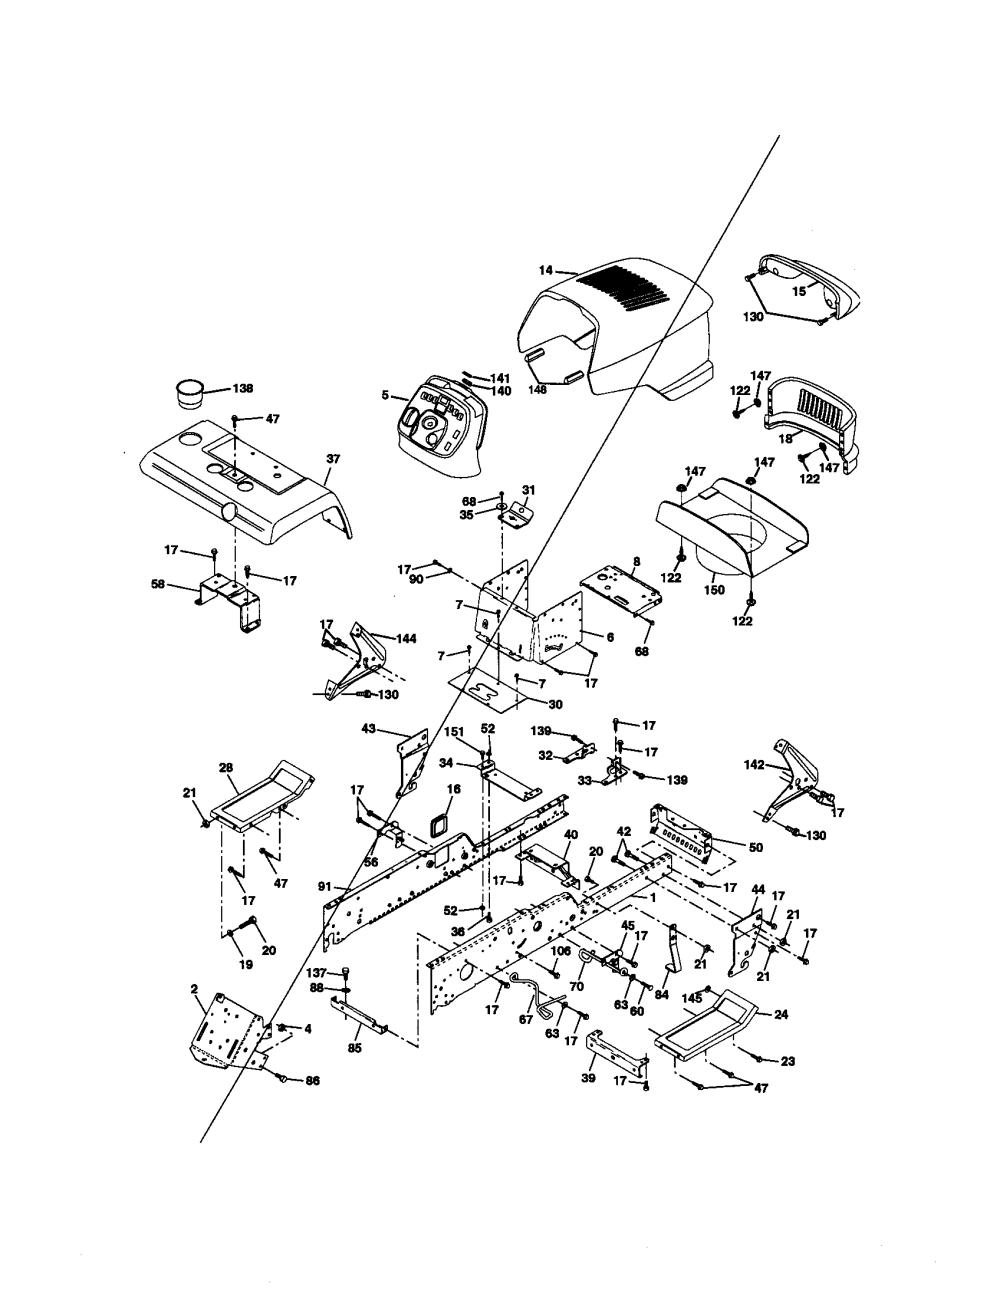 medium resolution of craftsman 917272950 chassis and enclosures diagram